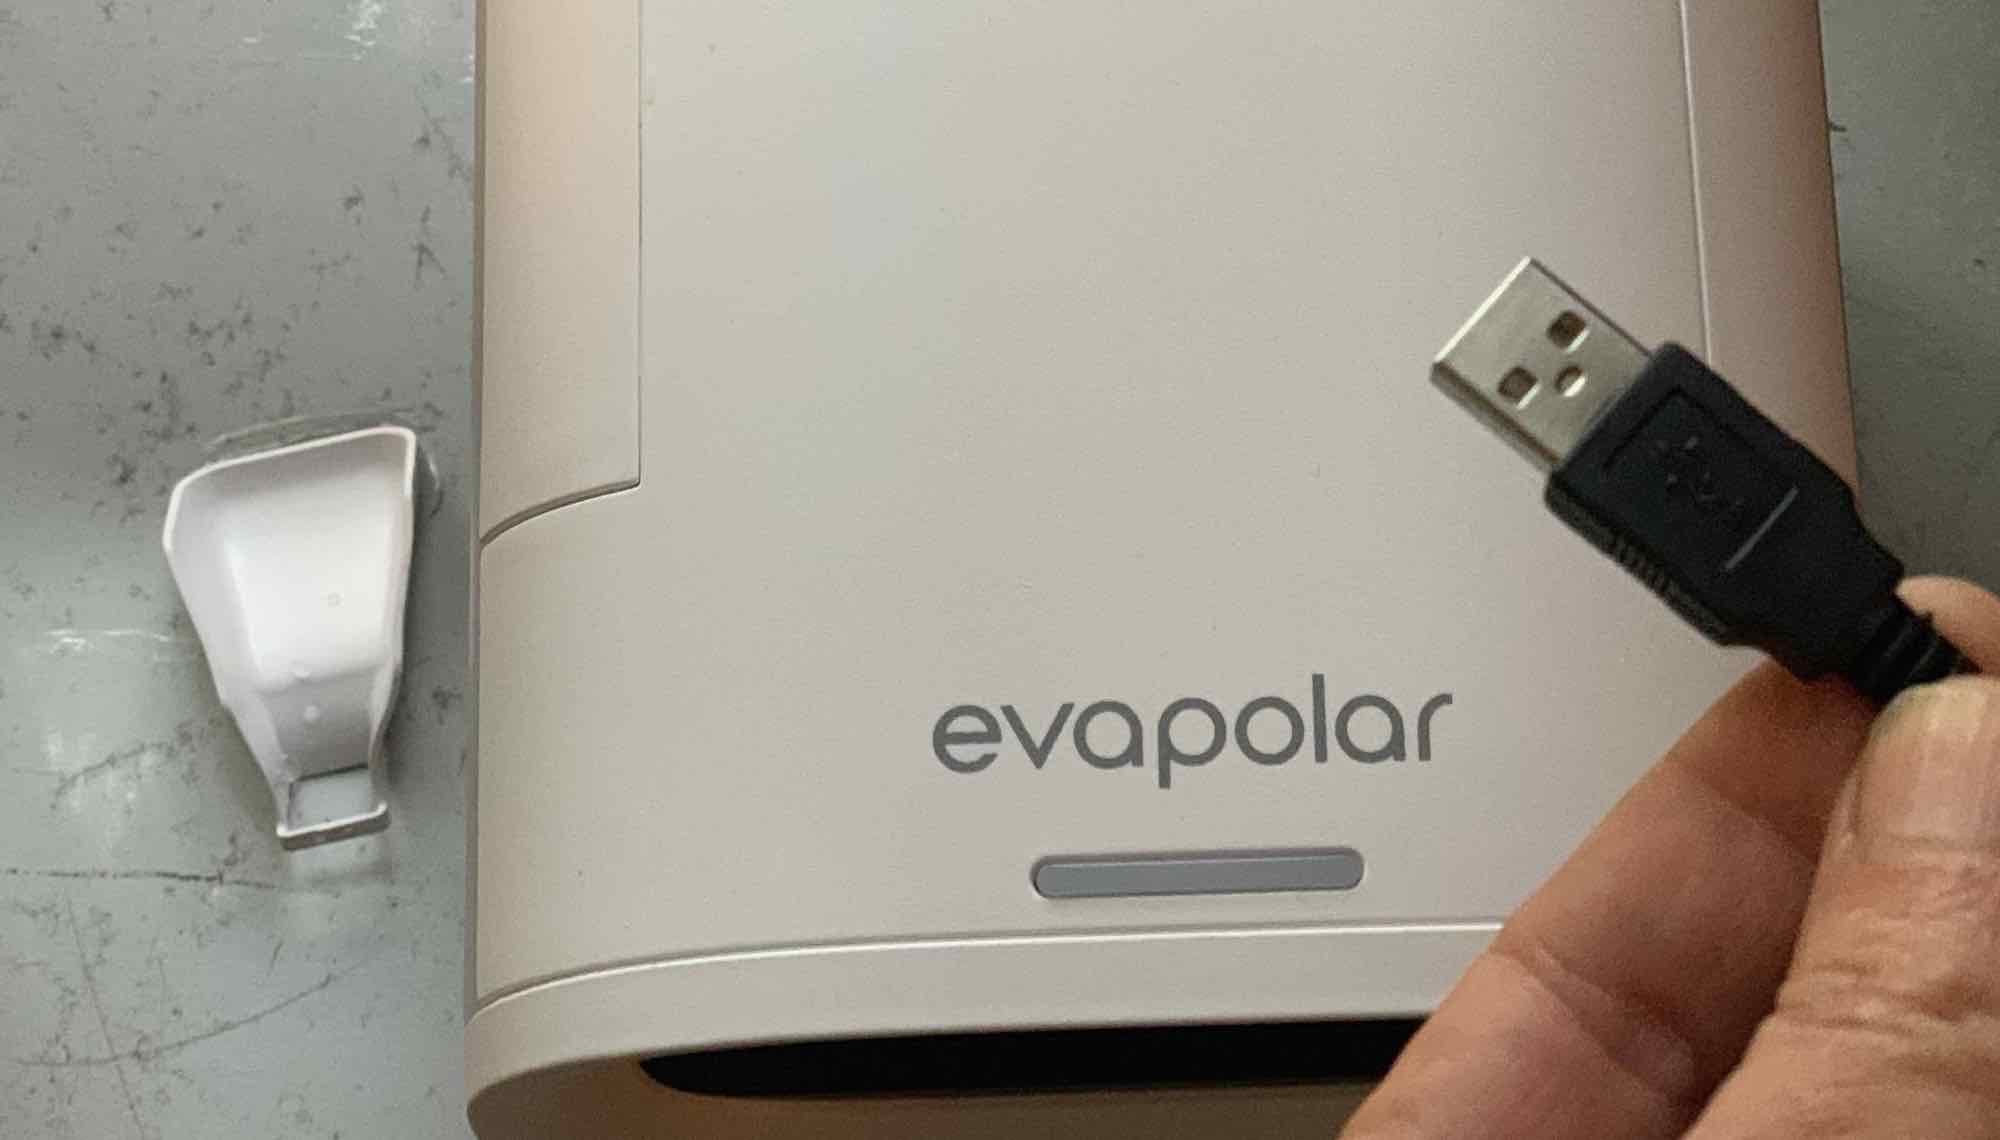 evapolar evachill usb plug in